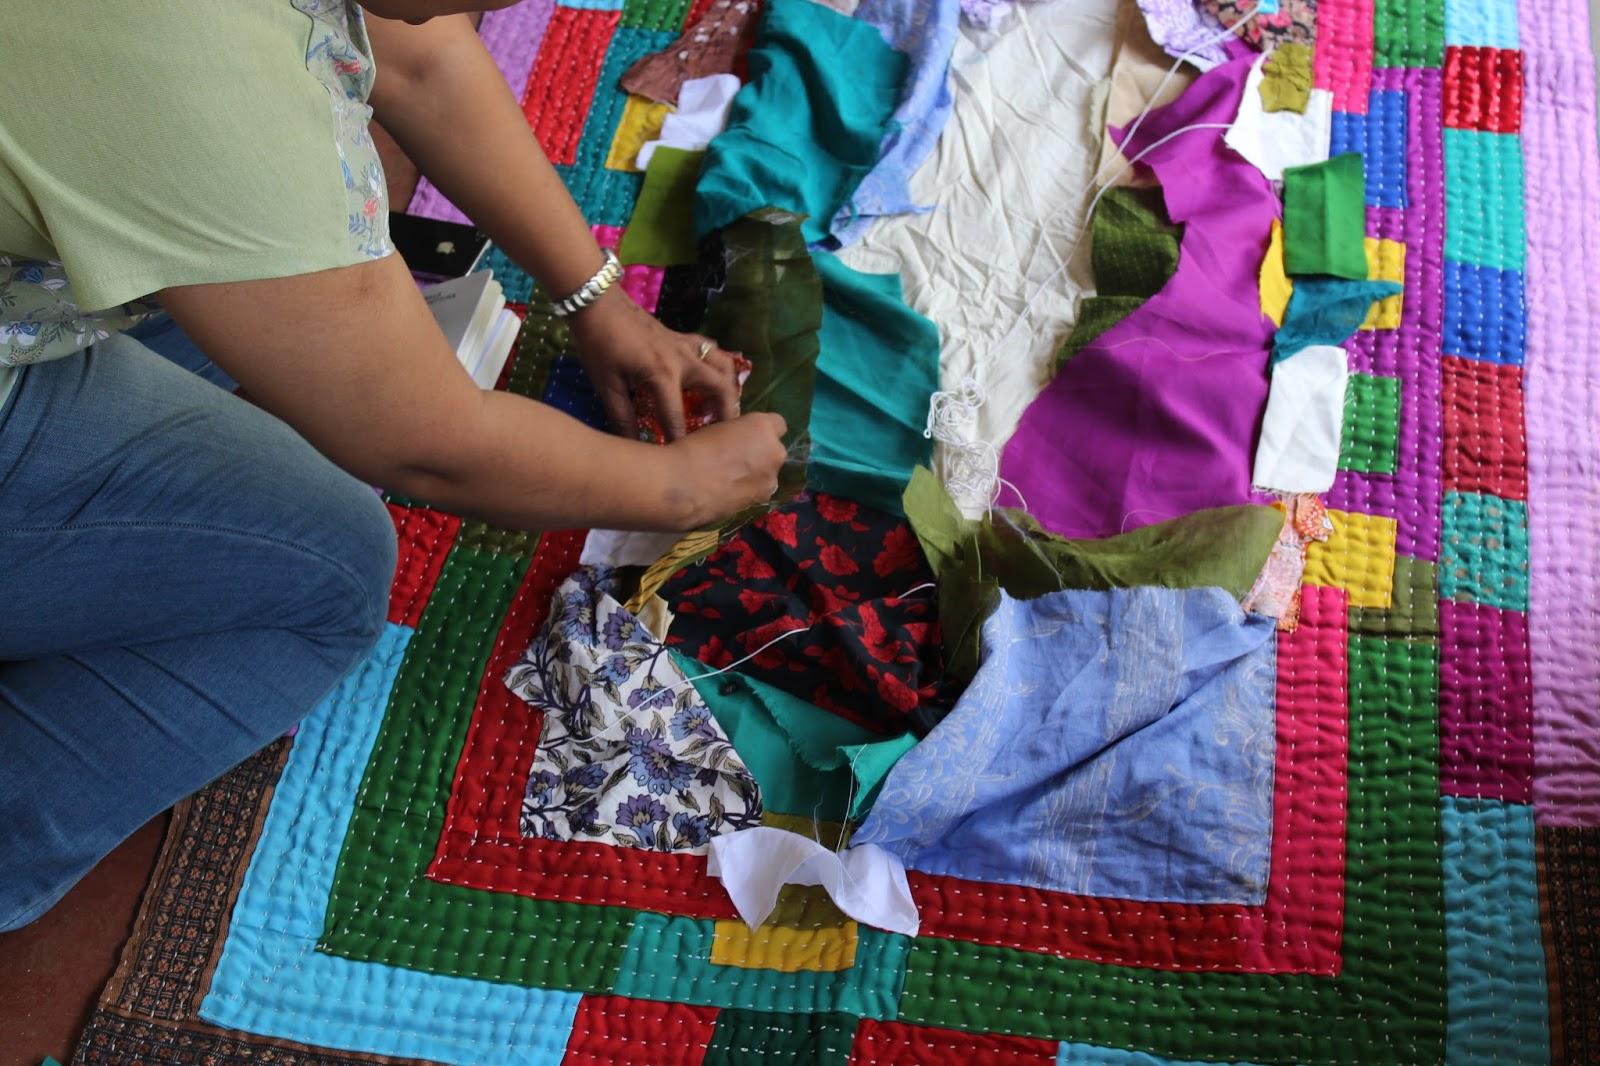 Siddi Quilts of Karnataka – Shruti Dandekar : how to make quilts at home - Adamdwight.com